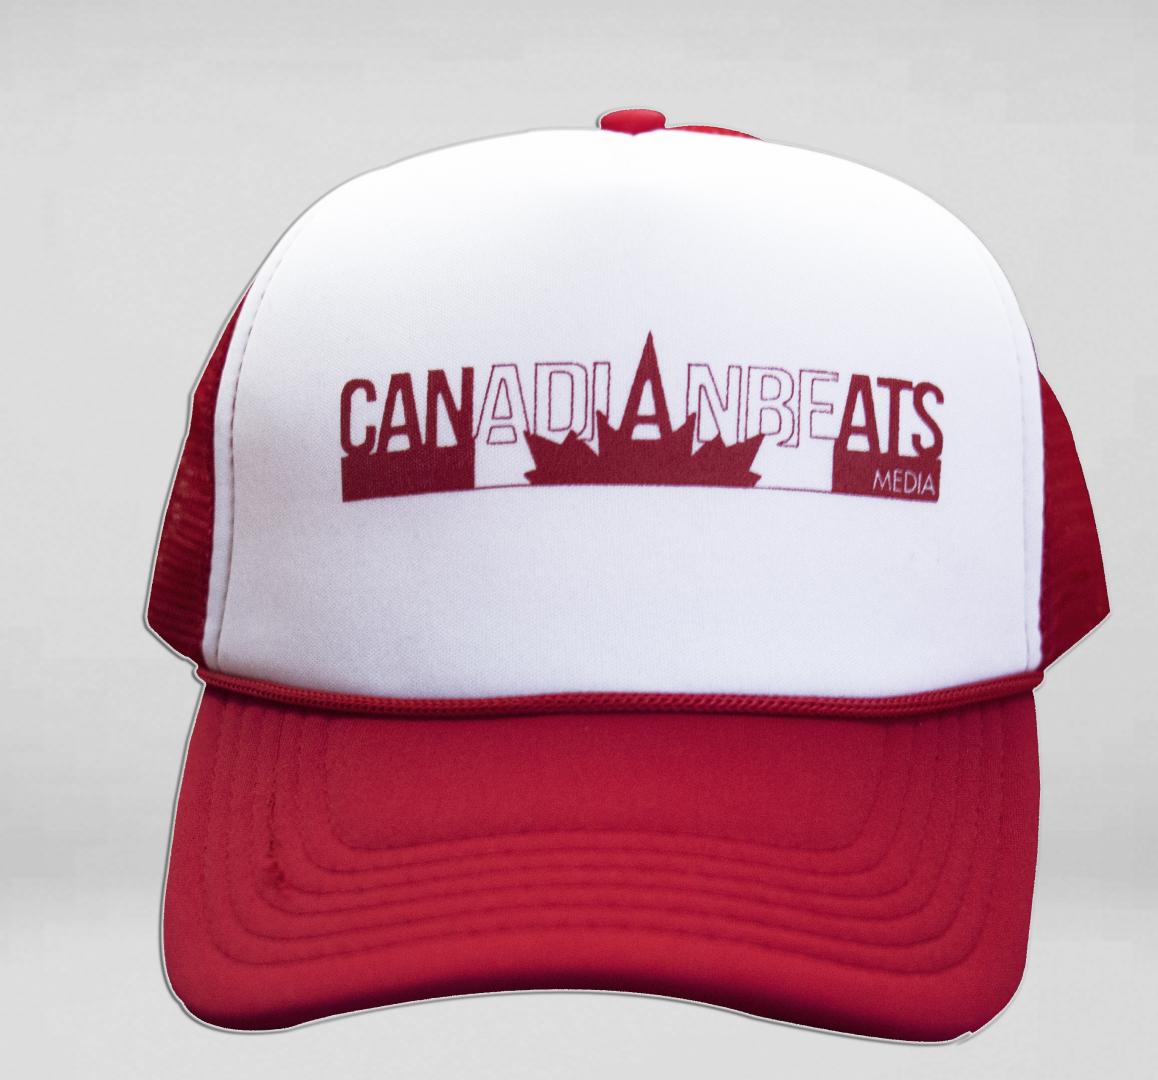 Canadian Beats Logo Trucker Hat – Red White – Canadian Beats Media 9fedf441545